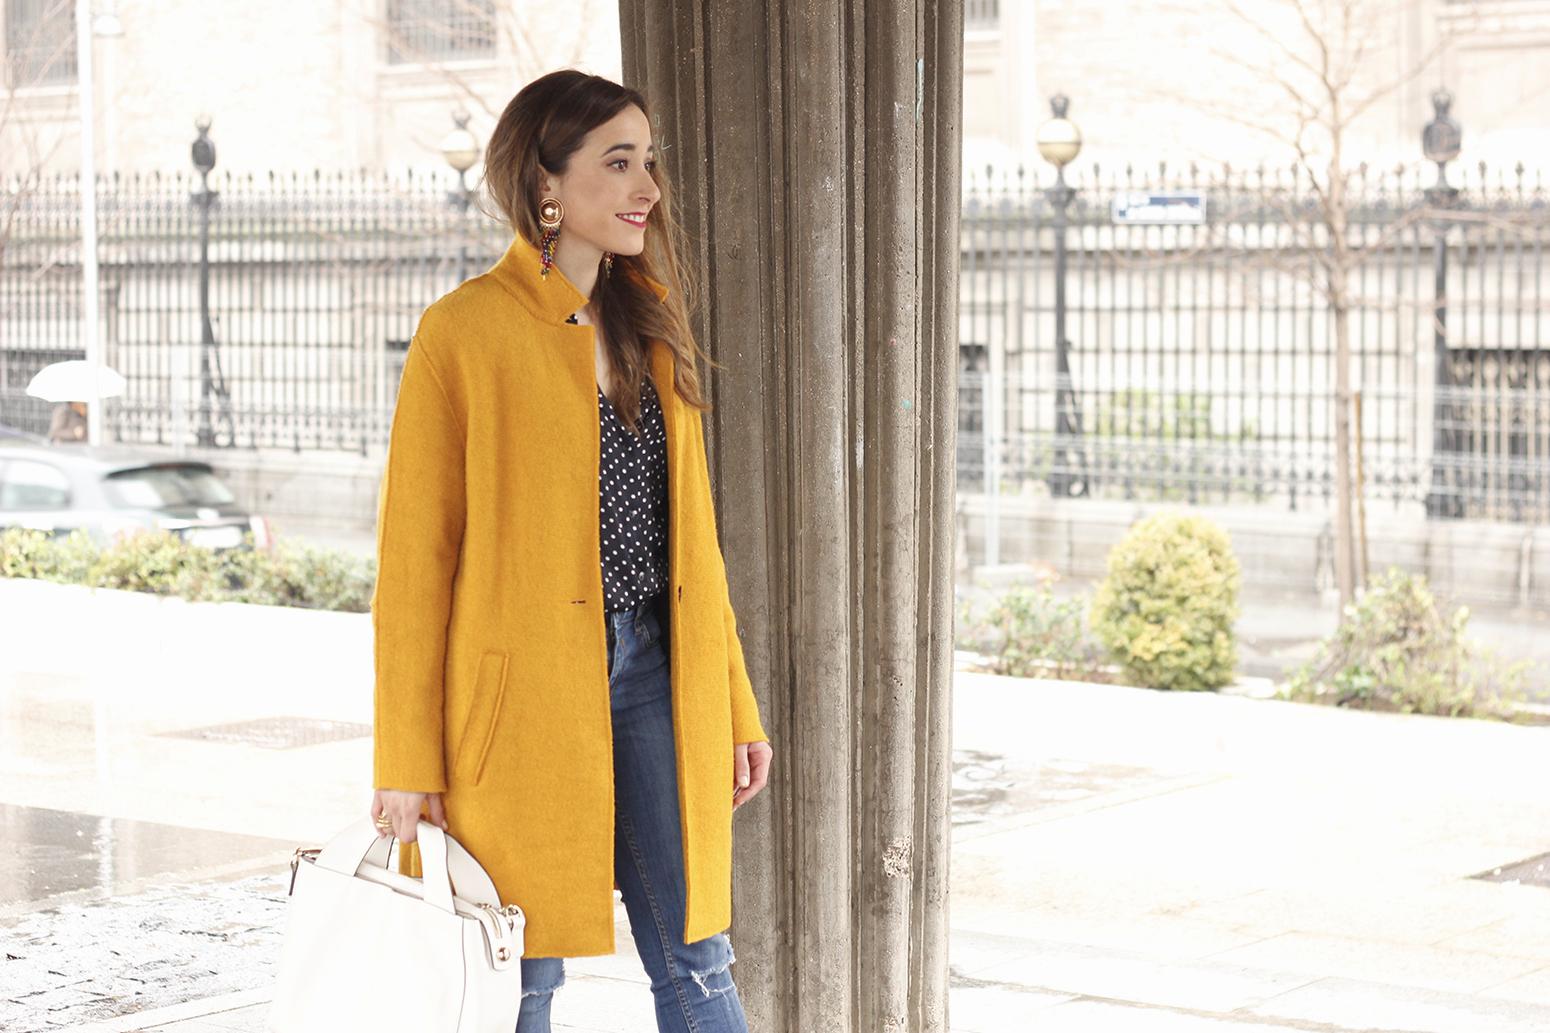 mustard coat polka dots shirt leopard heels white bag outfit 13